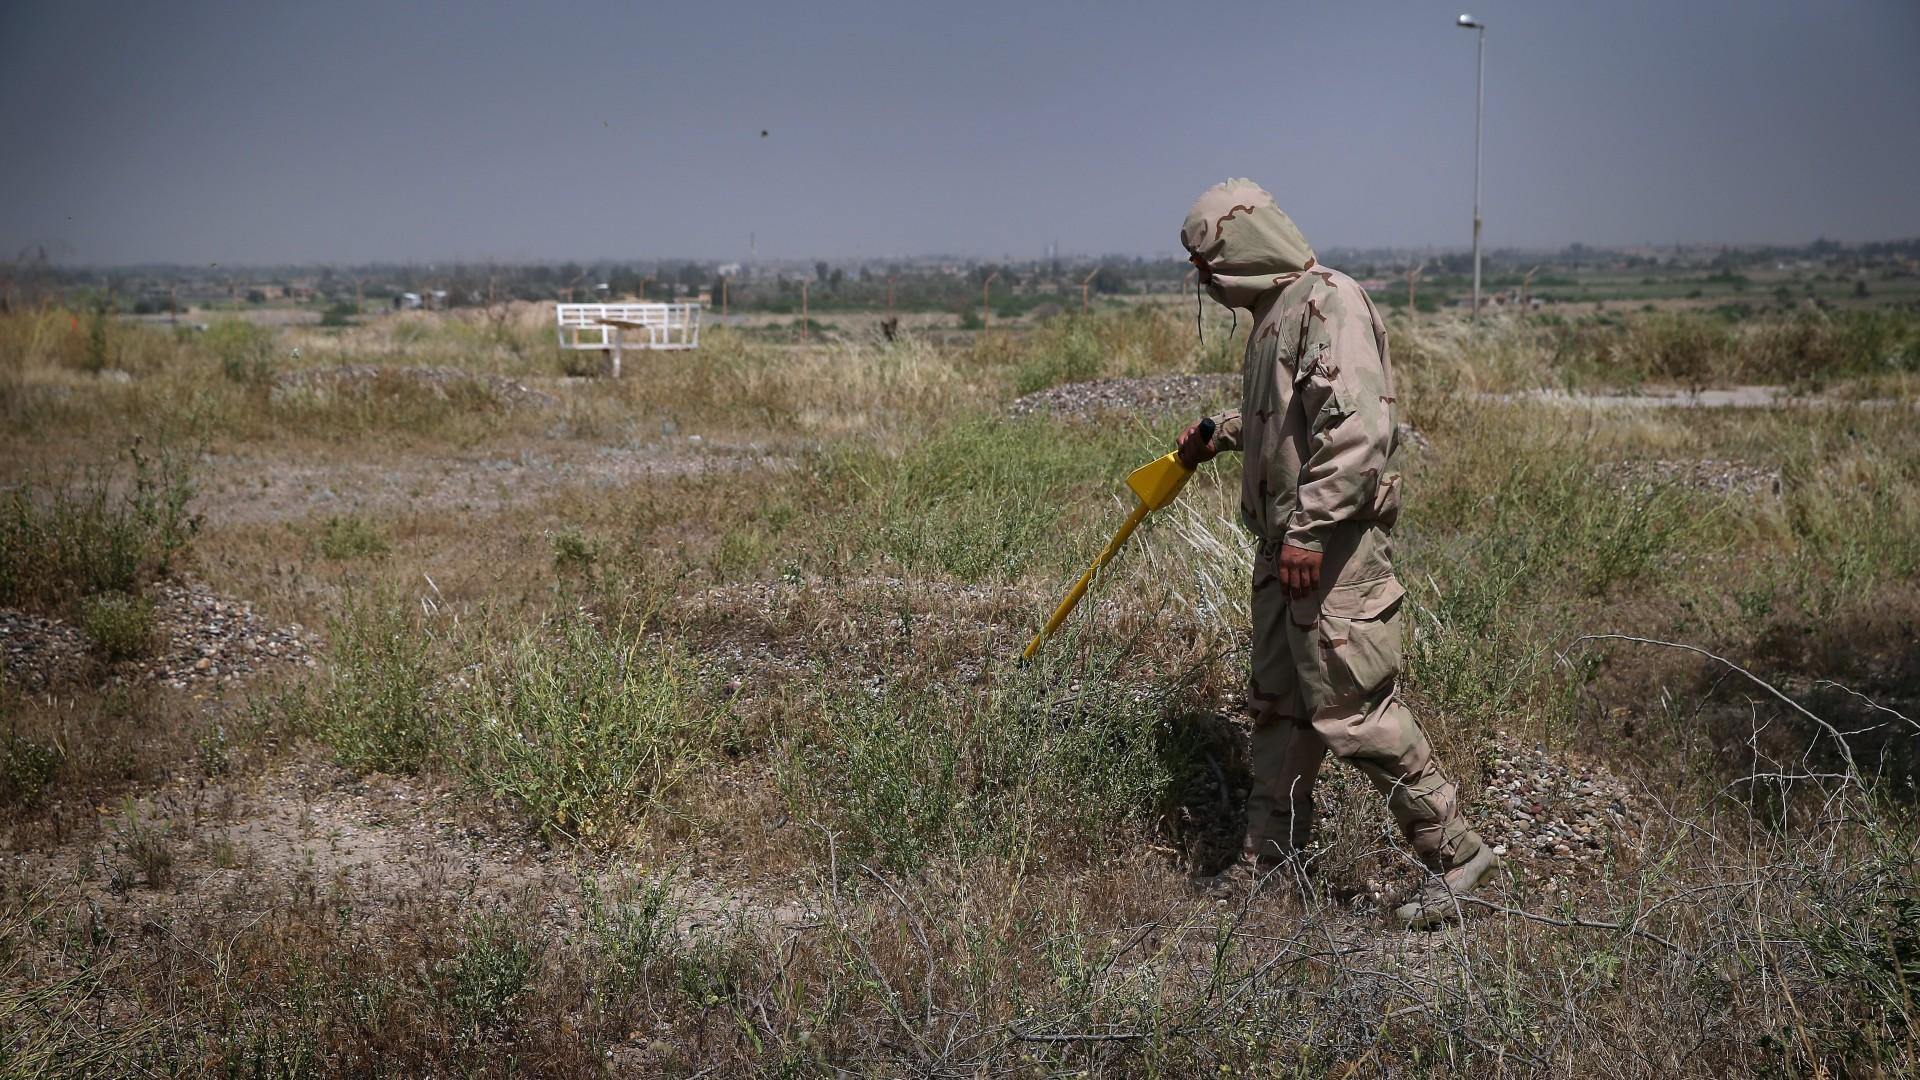 Chemical Weapons: An Insidious War